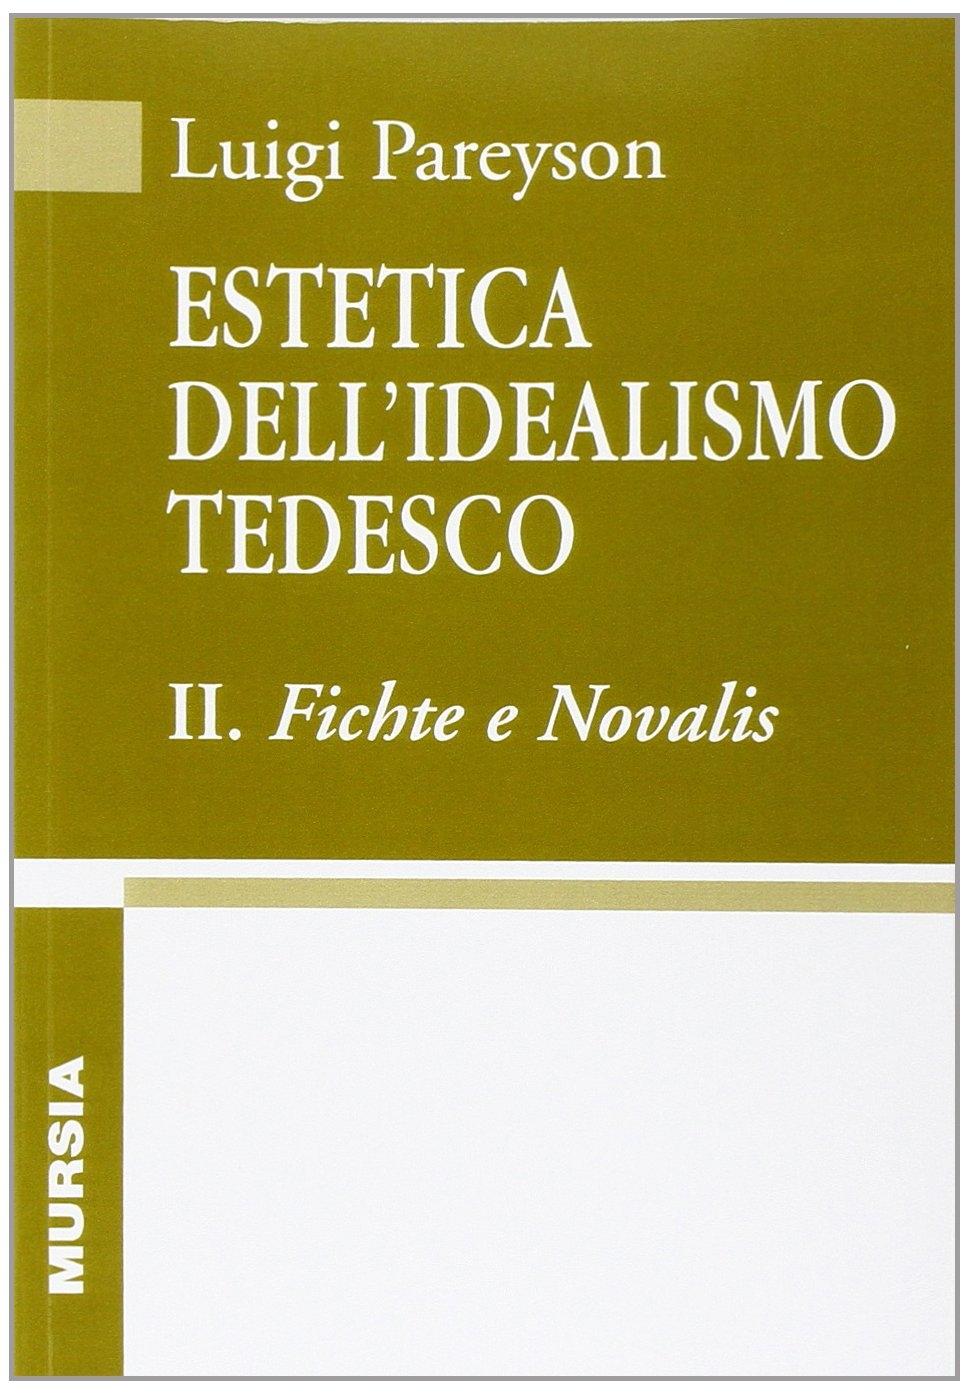 Estetica dell'idealismo tedesco. Vol. 2: Fichte e Novalis